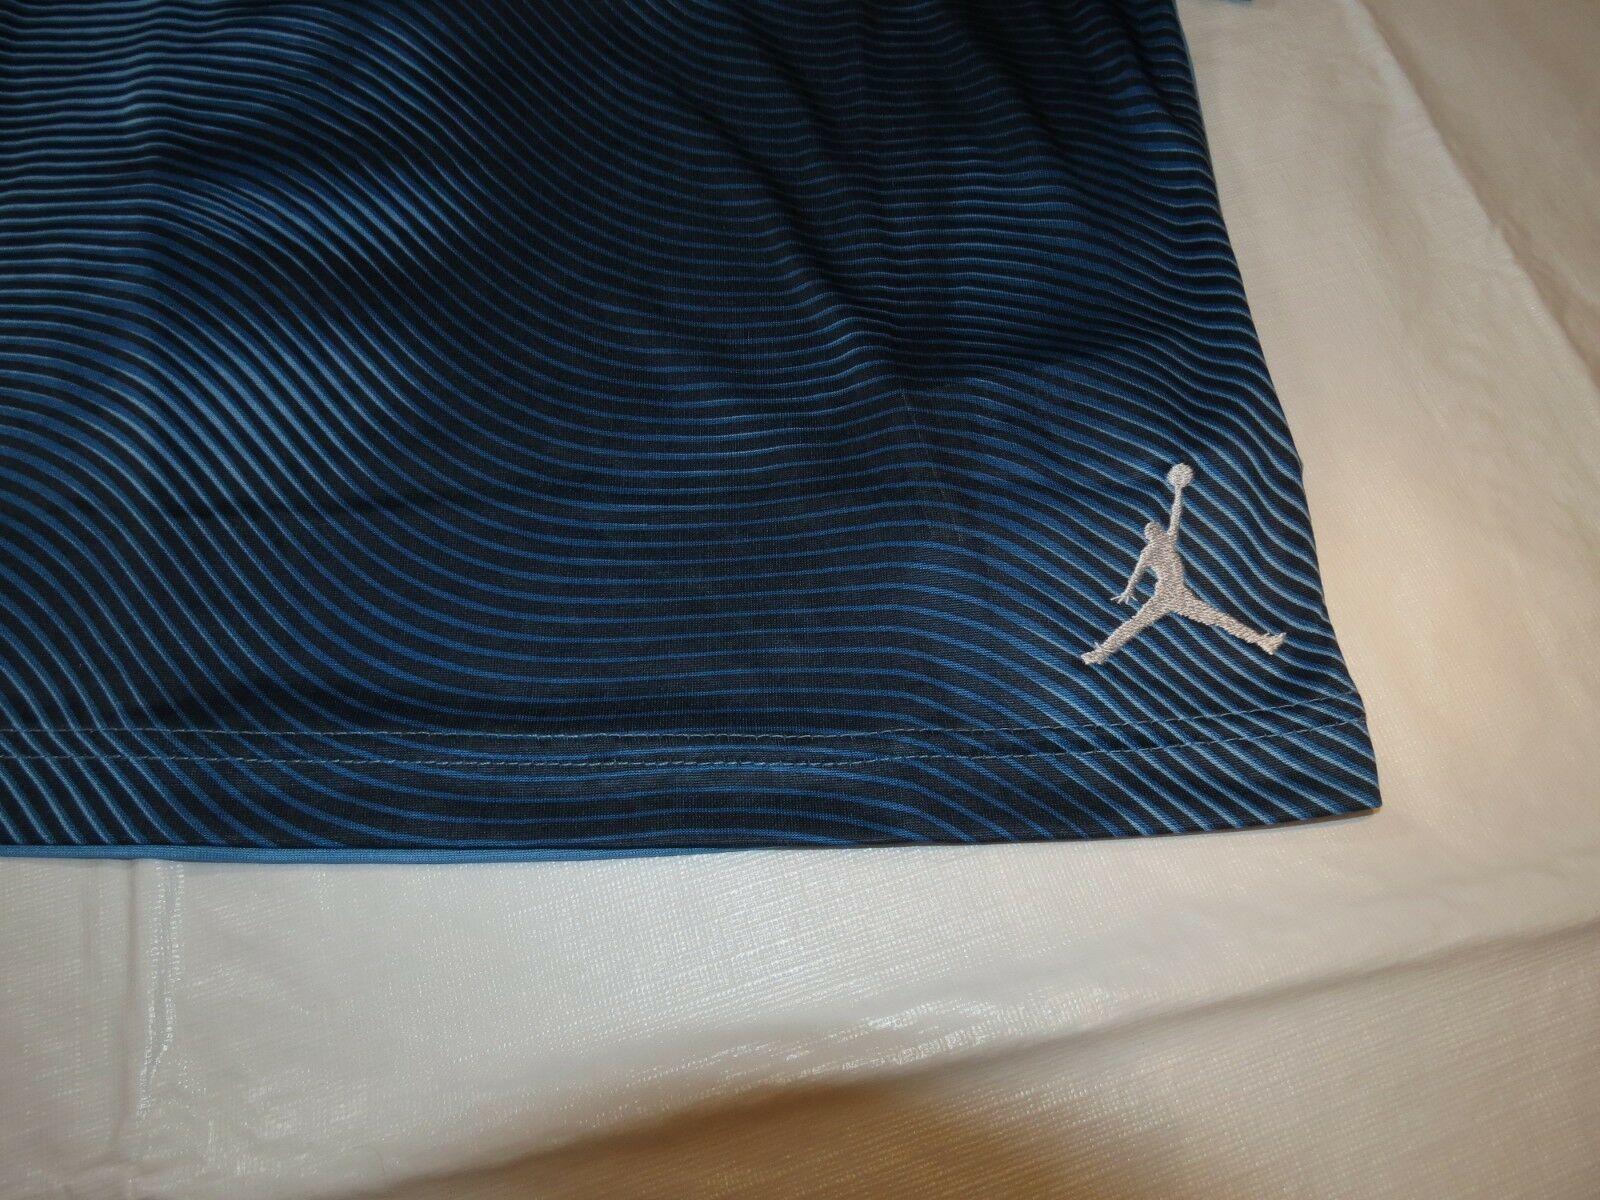 Jumpman Dri-Fit Youth Boys short sleeve t shirt M 10-12 953369 206 Univ Blue image 3